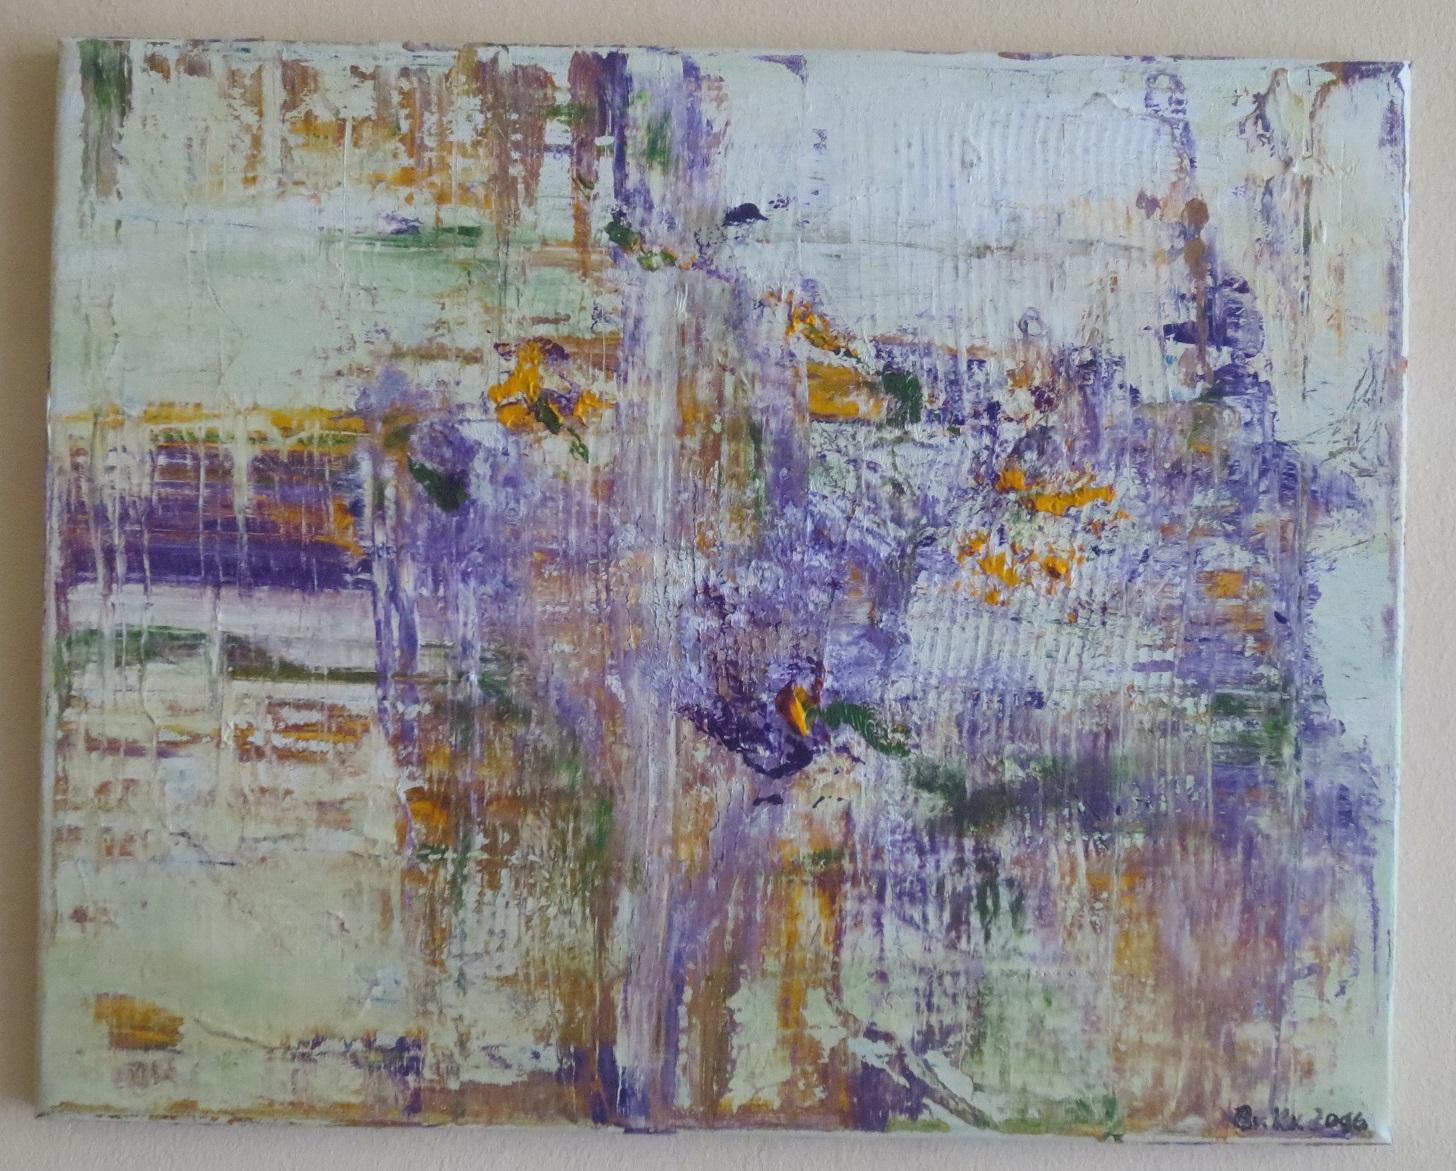 3-2016 Acryl auf leinwand 40x50